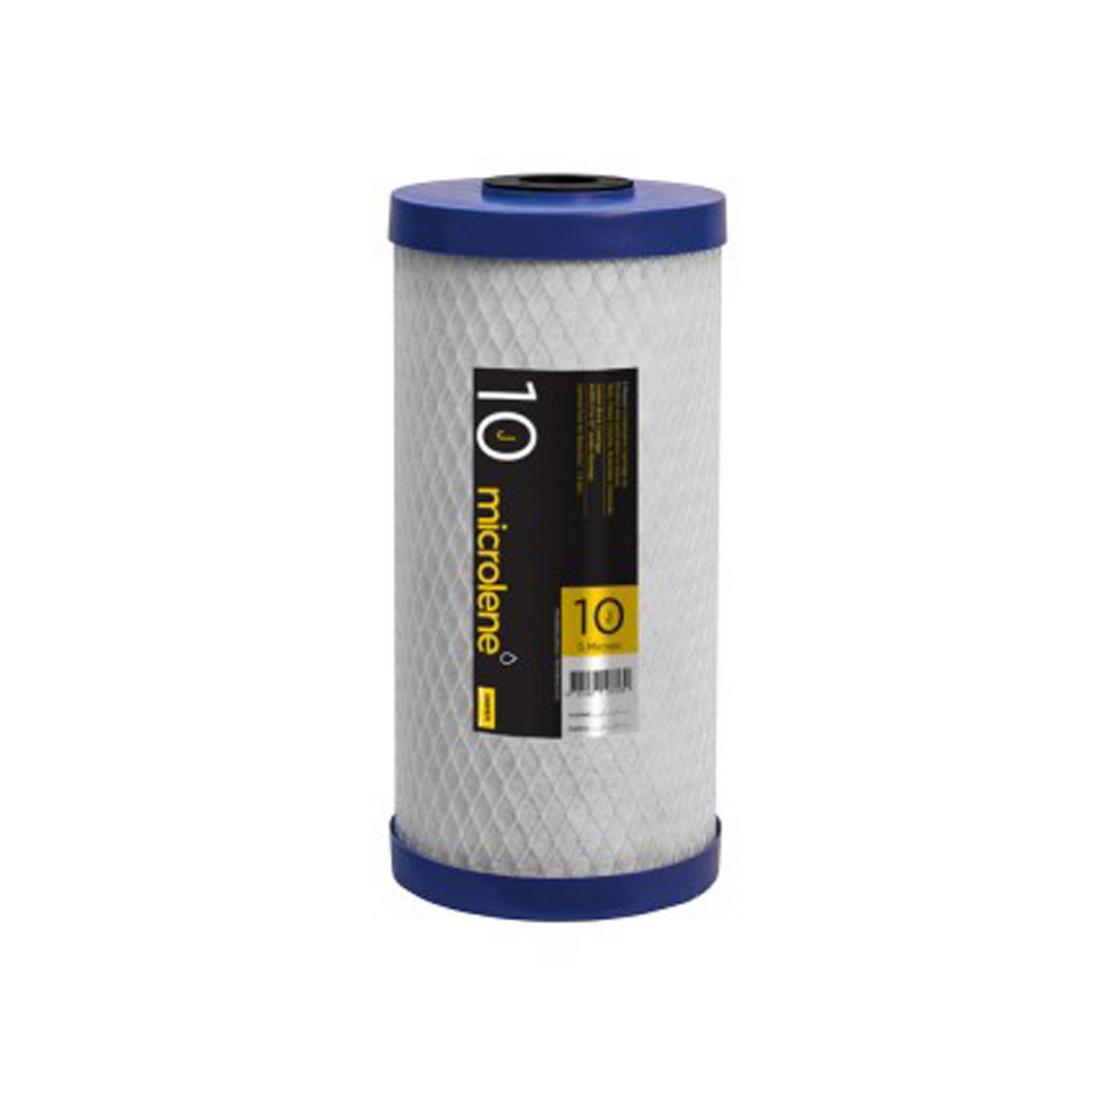 Davey Filterpure Microlene Carbon Block Cartridge 3.8 l/min 10 micron ACBM10